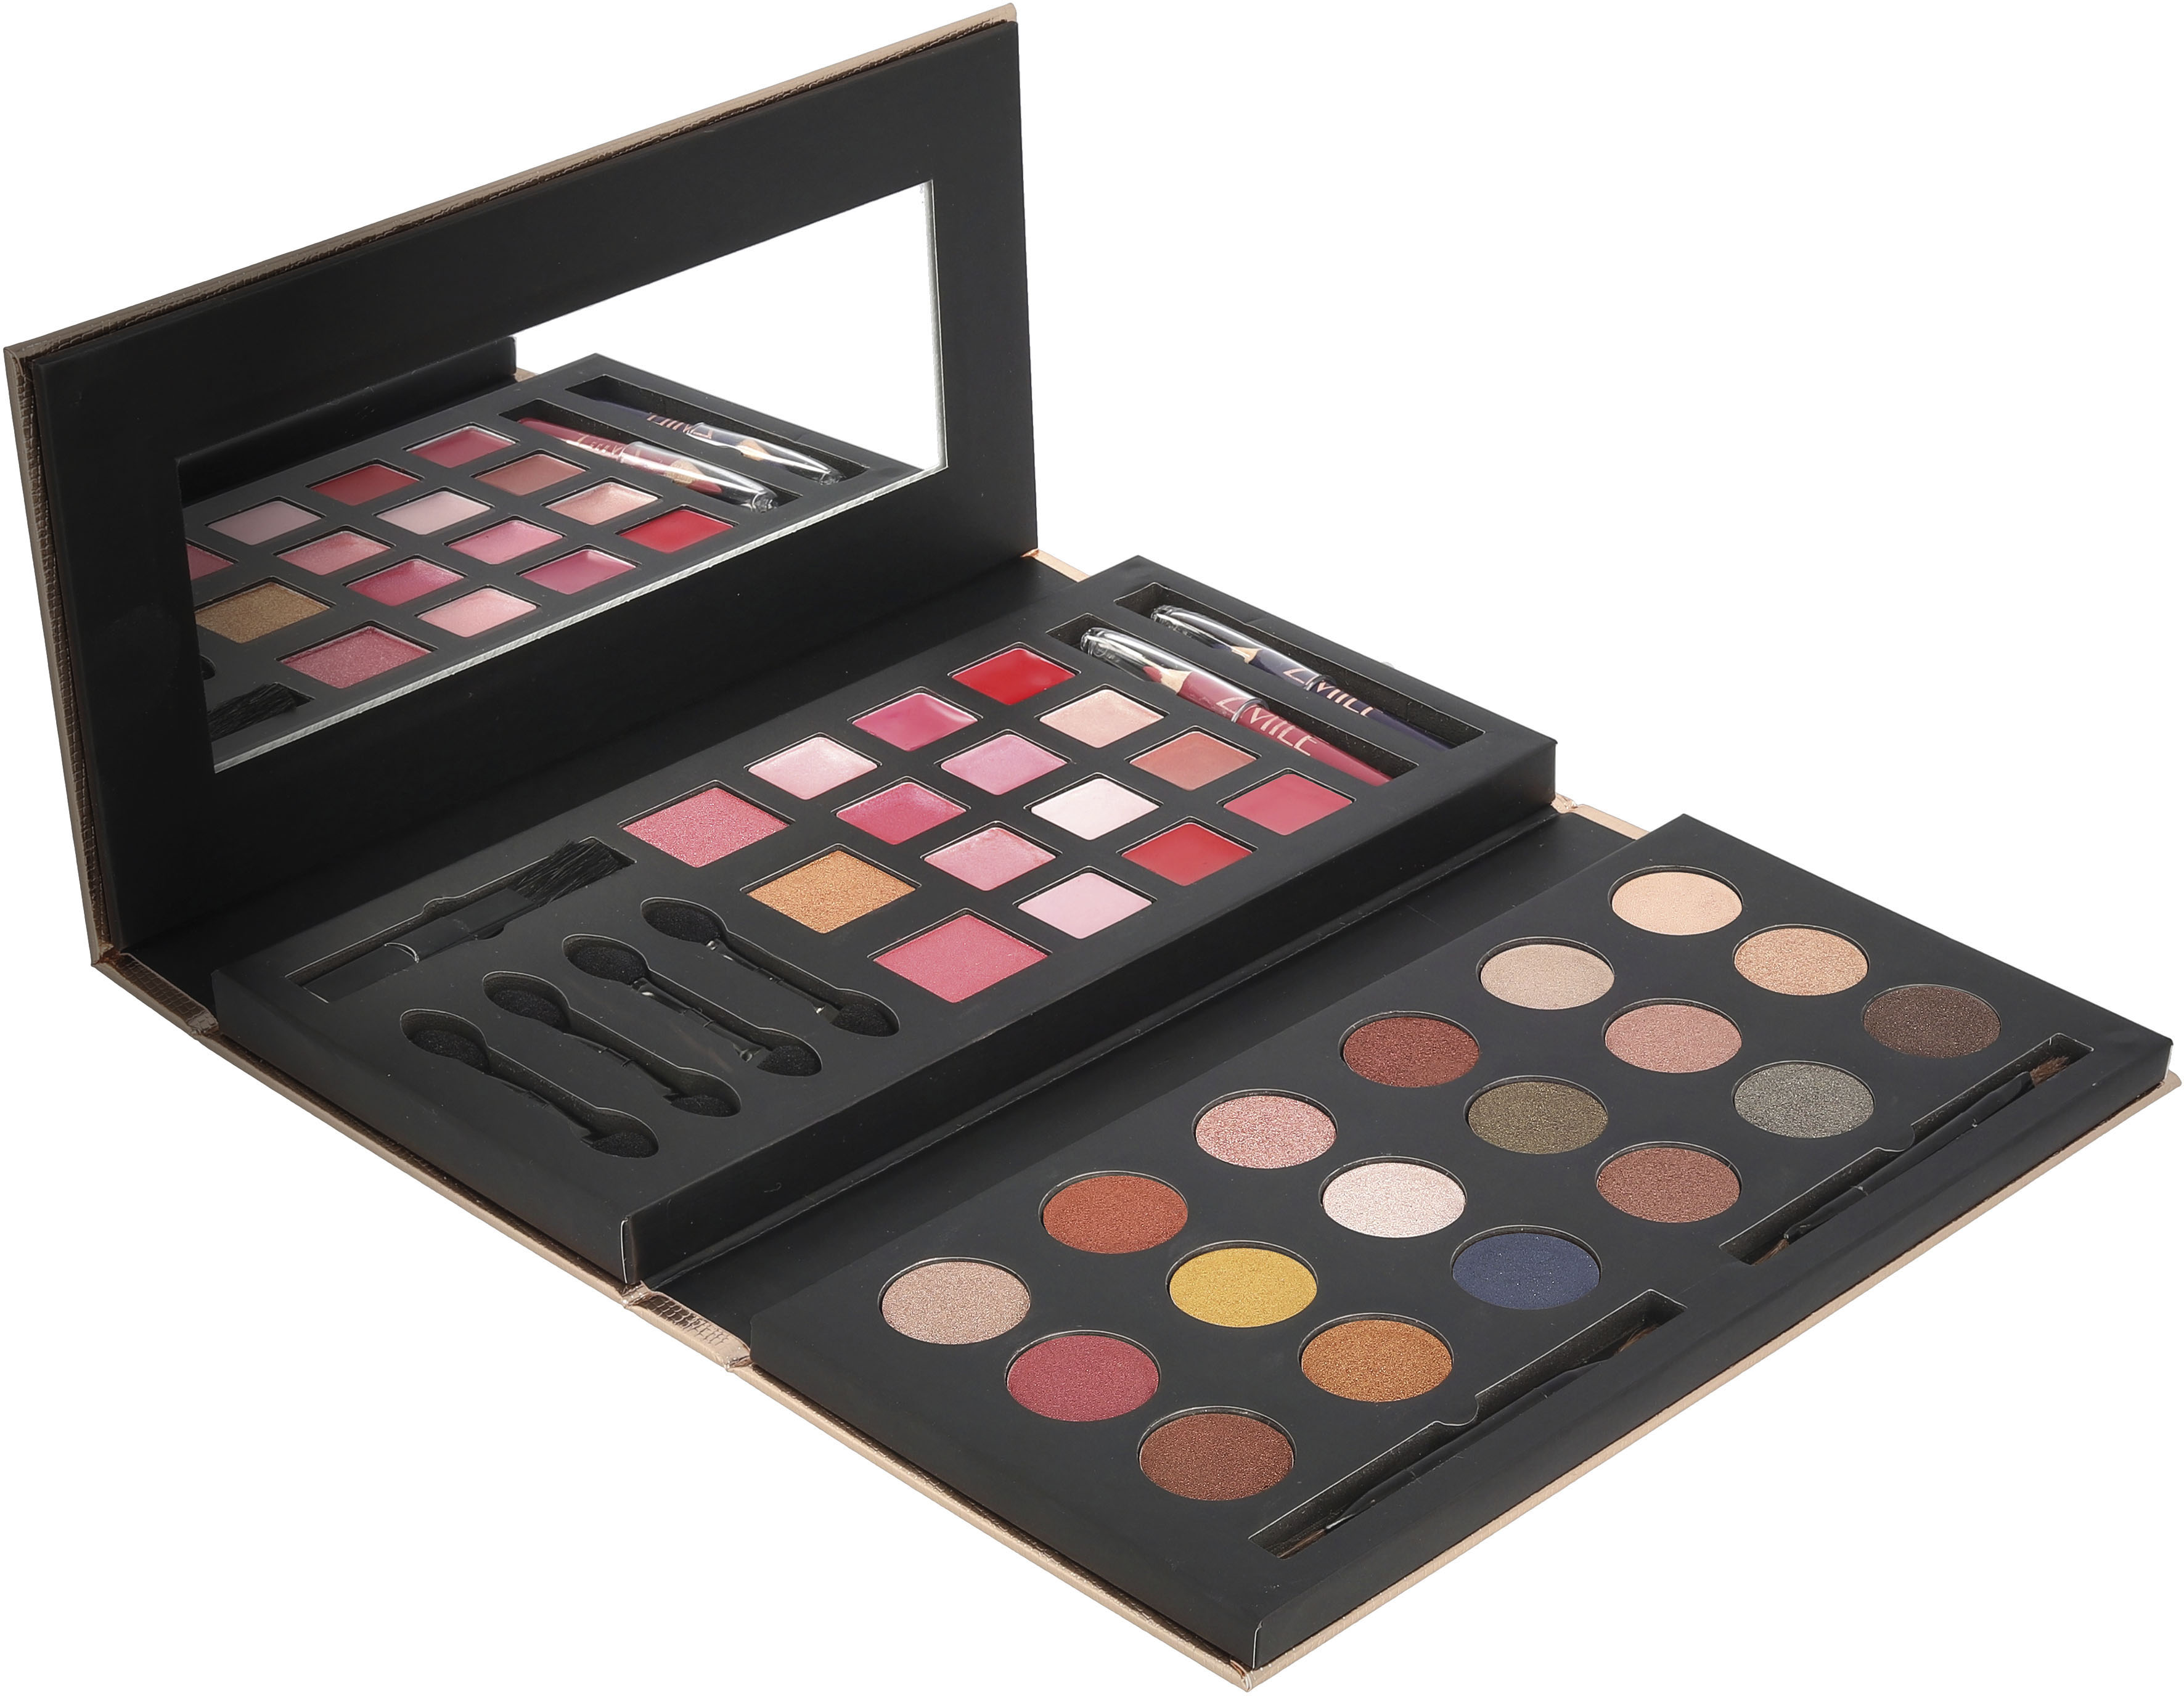 ZMILE COSMETICS Kosmetik-Koffer Glam to Go, (37 tlg.) günstig online kaufen